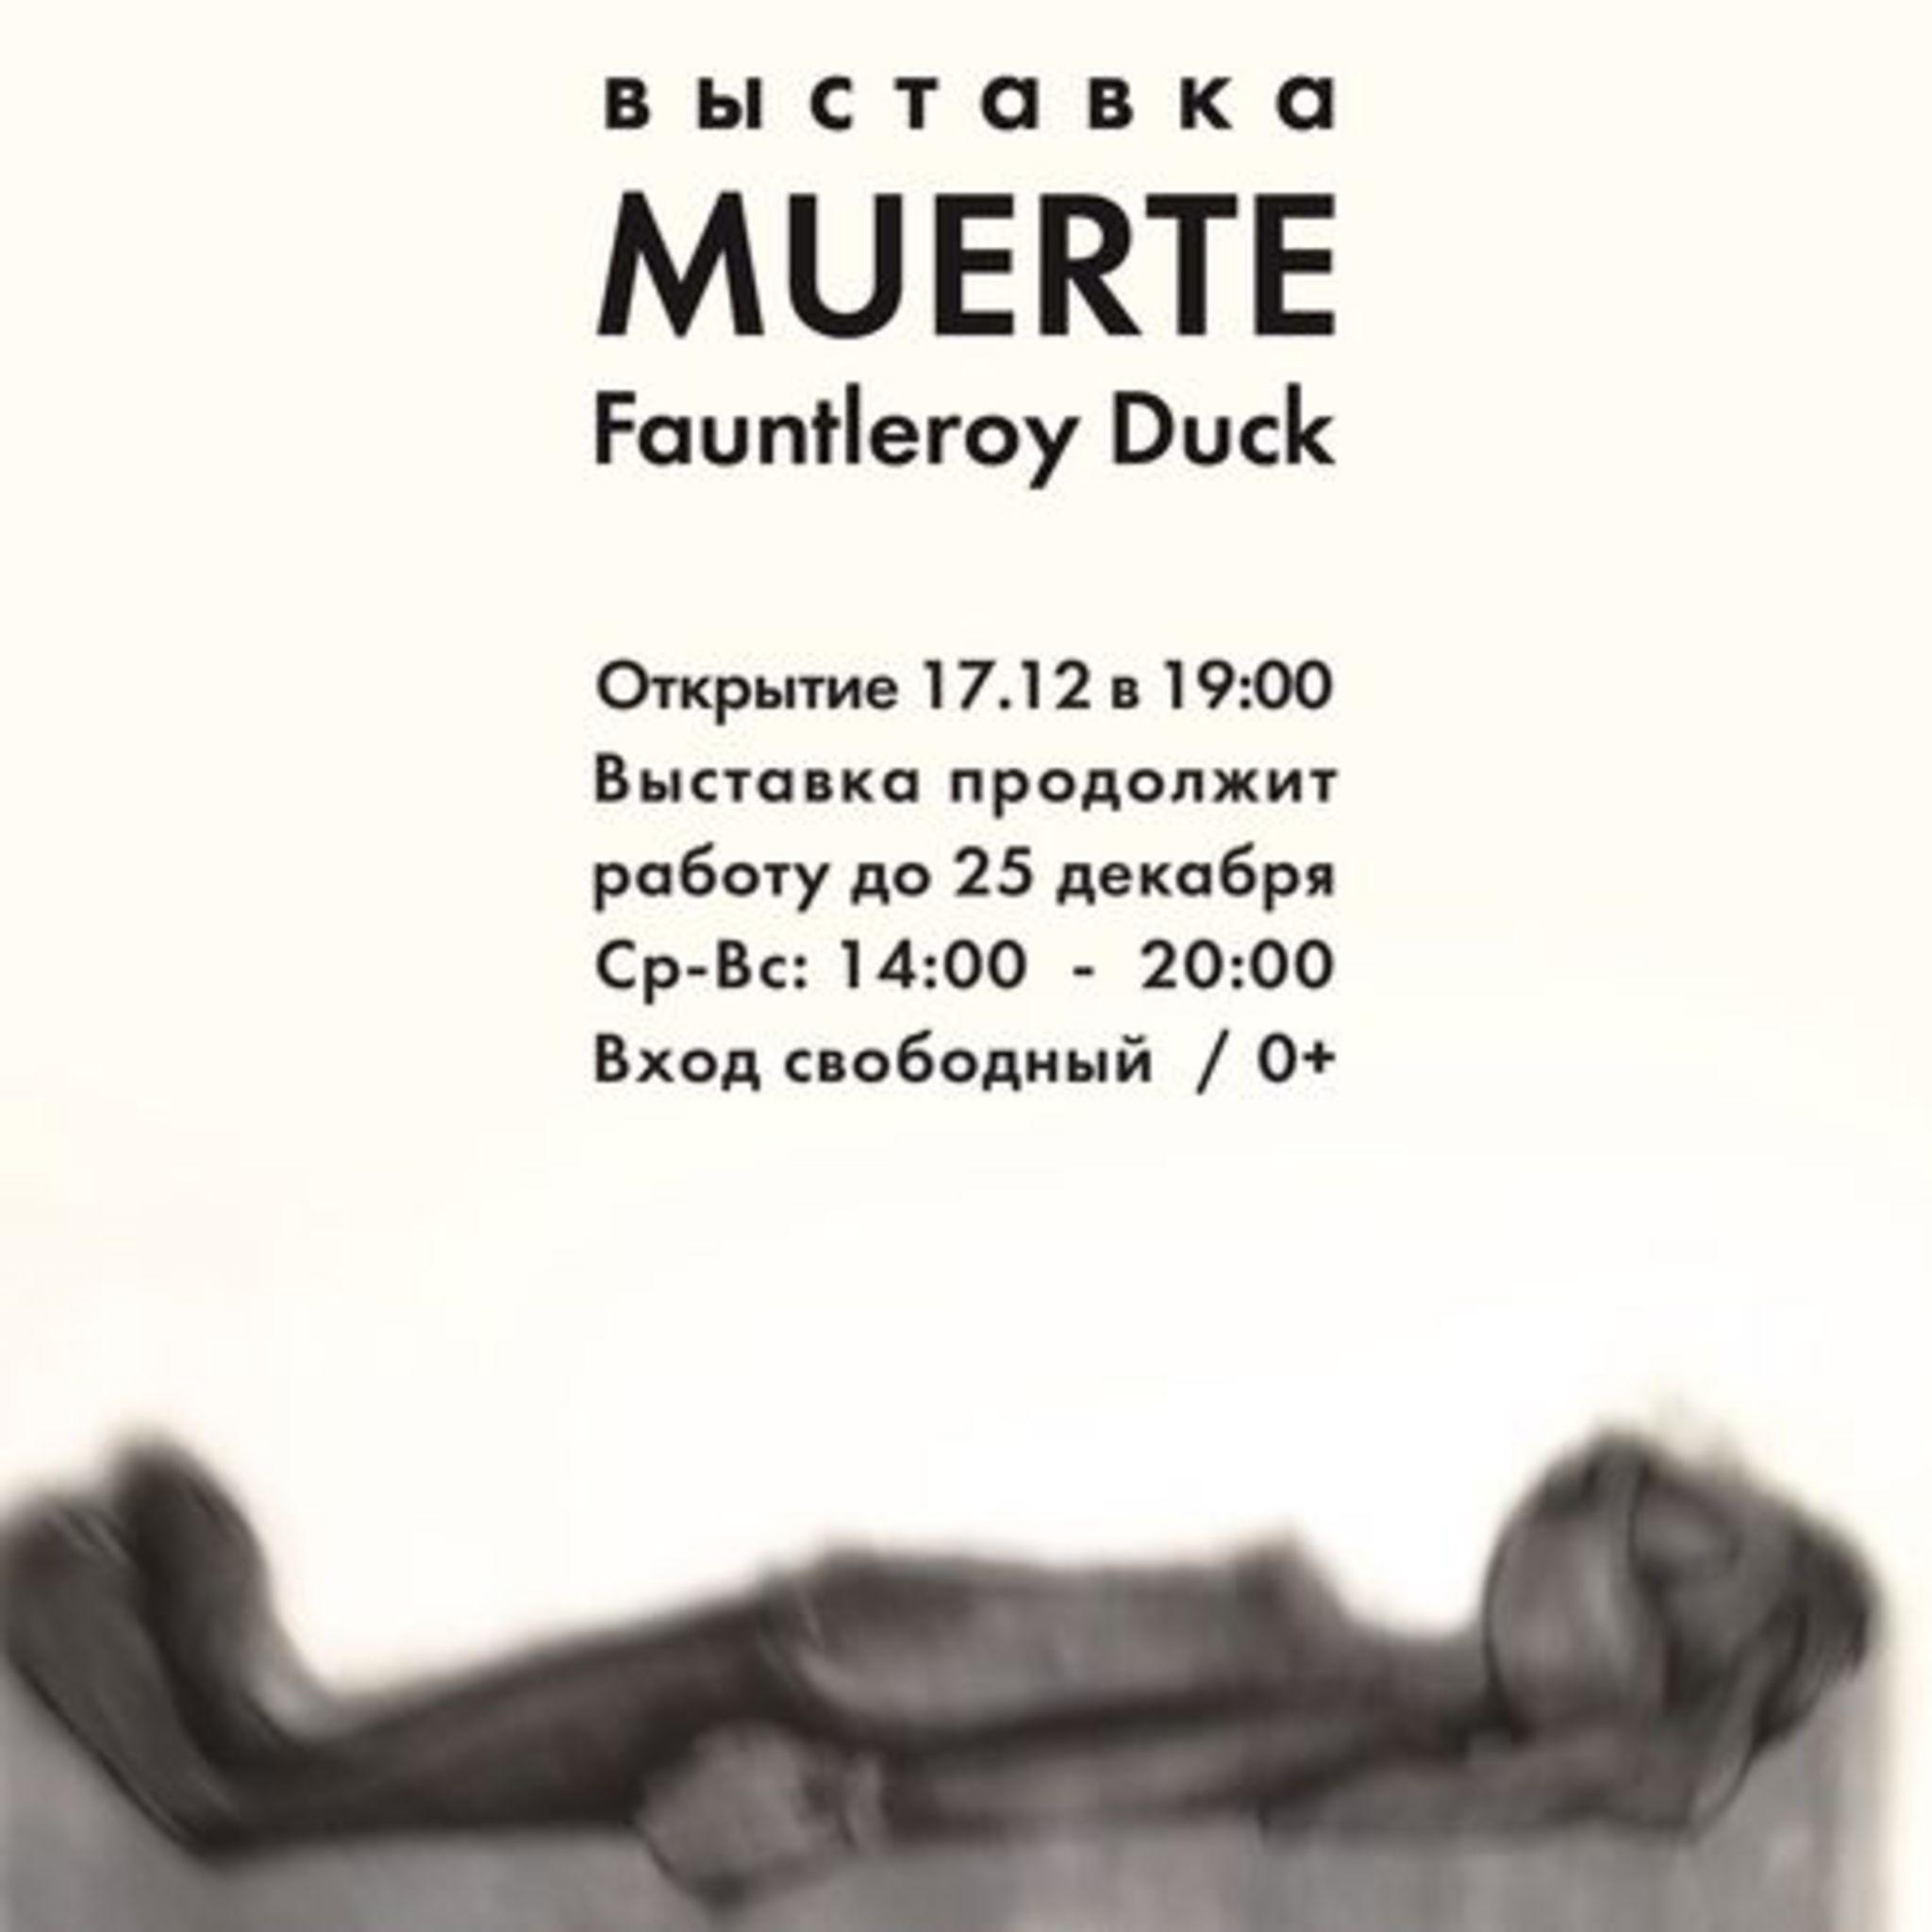 Выставка Fauntleroy Duck «MUERTE»